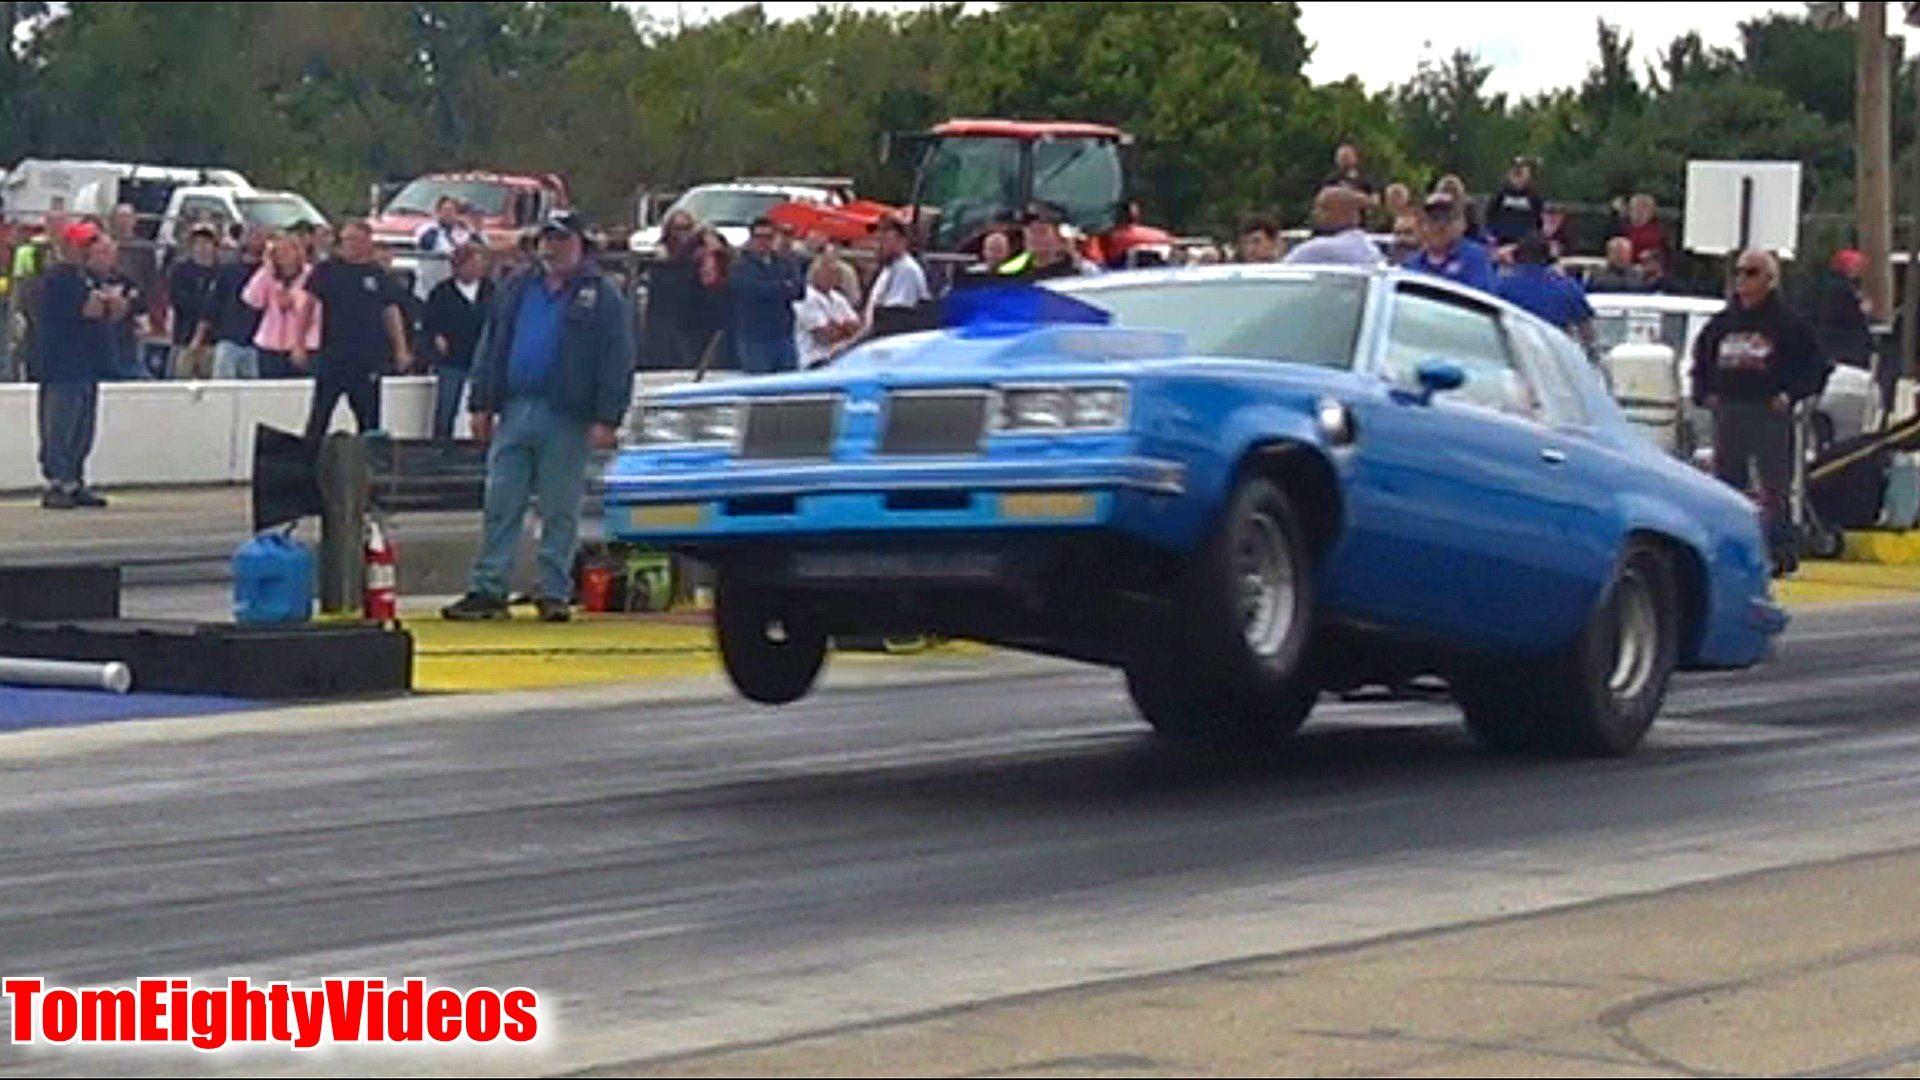 Dalin smith oldsmobile cutlass drag racing super cars